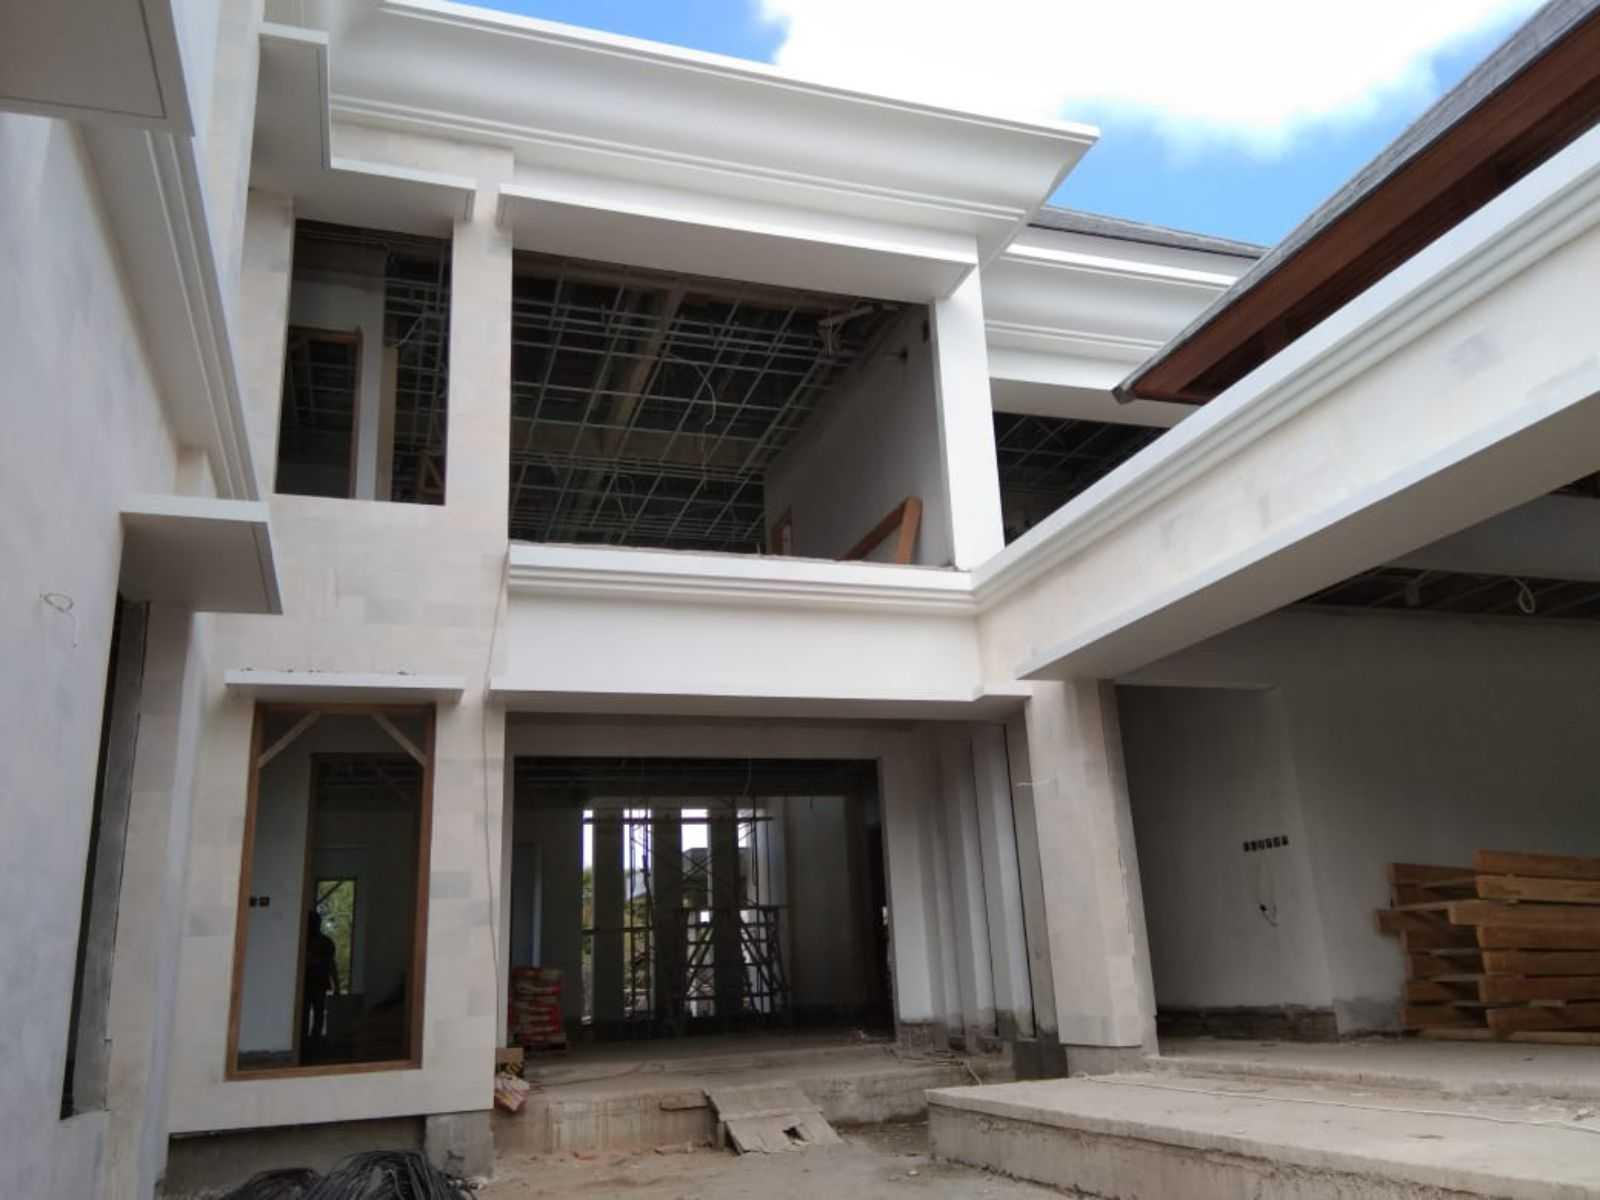 Emporio Architect In Progress Villa Bali Tropis 216  @ Denpasar Kota Denpasar, Bali, Indonesia Kota Denpasar, Bali, Indonesia Emporio-Architect-Progress-Villa-Bali-Tropis-216-Denpasar  75656